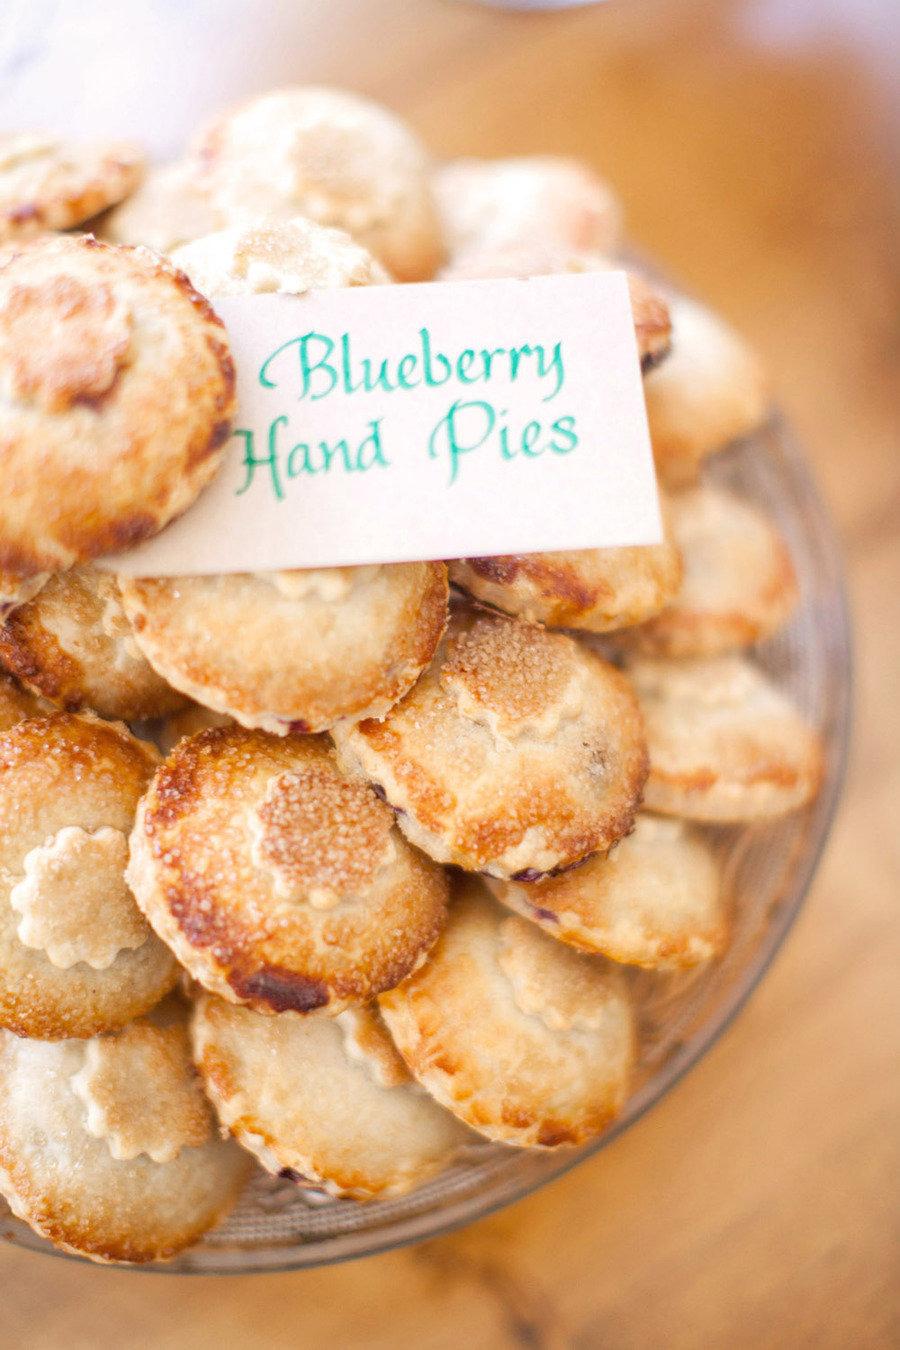 Wedding Dessert Ideas Instead Of Cake Other Than Desserts Not